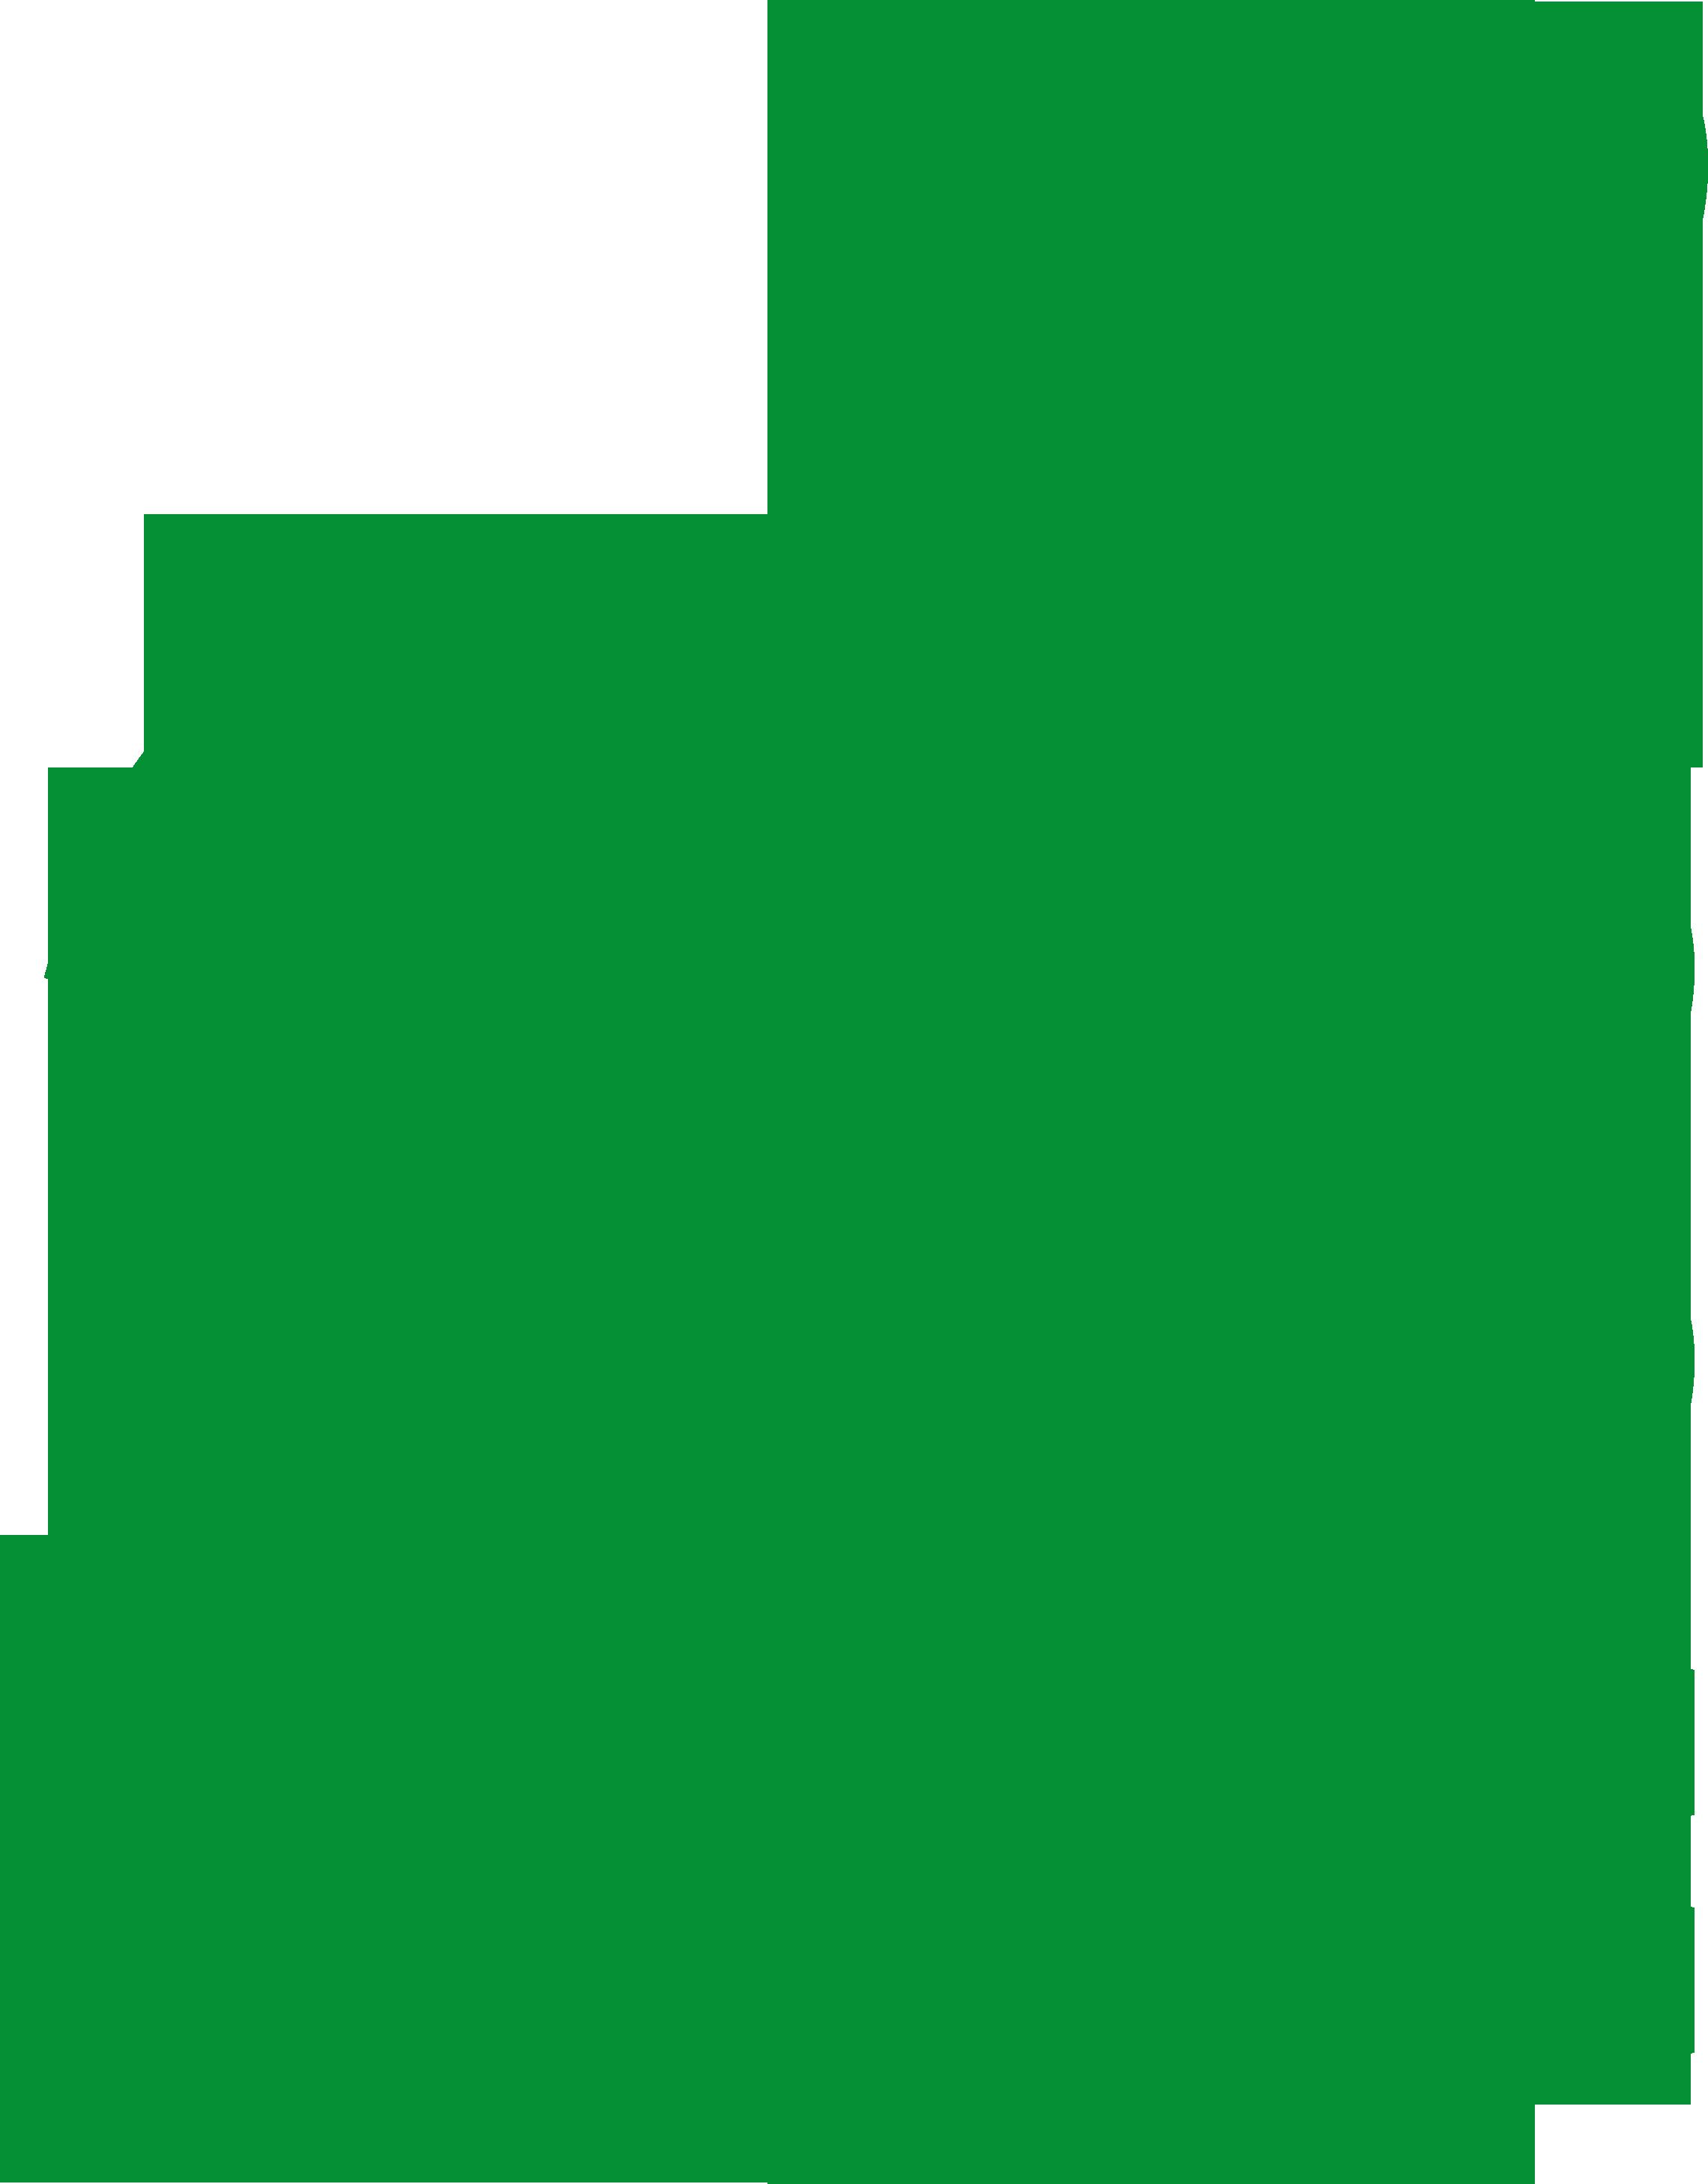 Plant Matter | Distributor | 3 Weeds